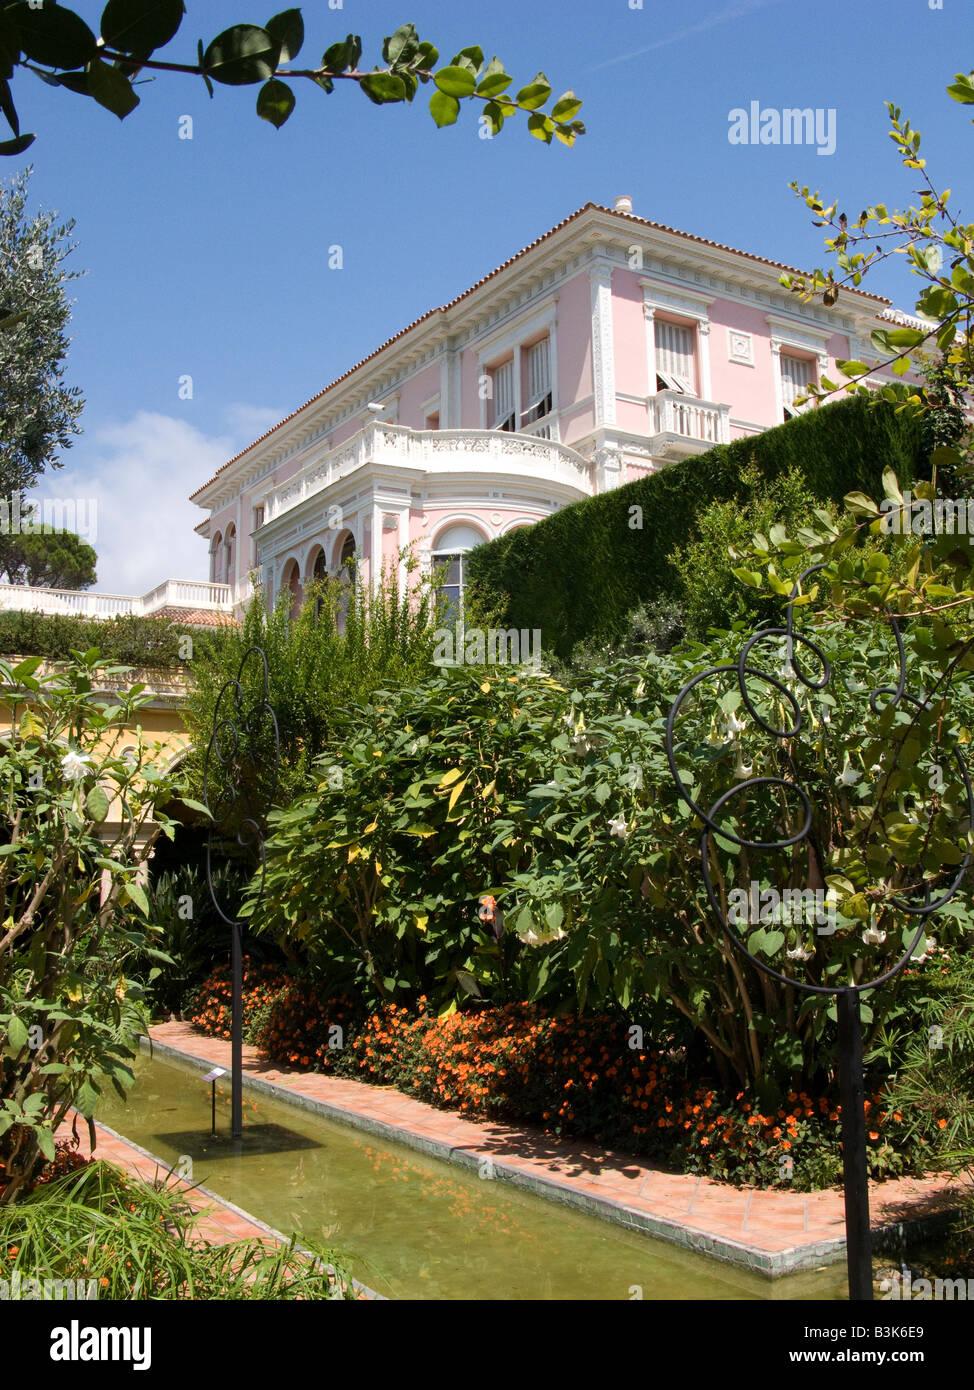 The Gardens and Villa of Ephrussi de Rothschild on Cap Ferrat near Nice, Cote d Azur Provence of France - Stock Image